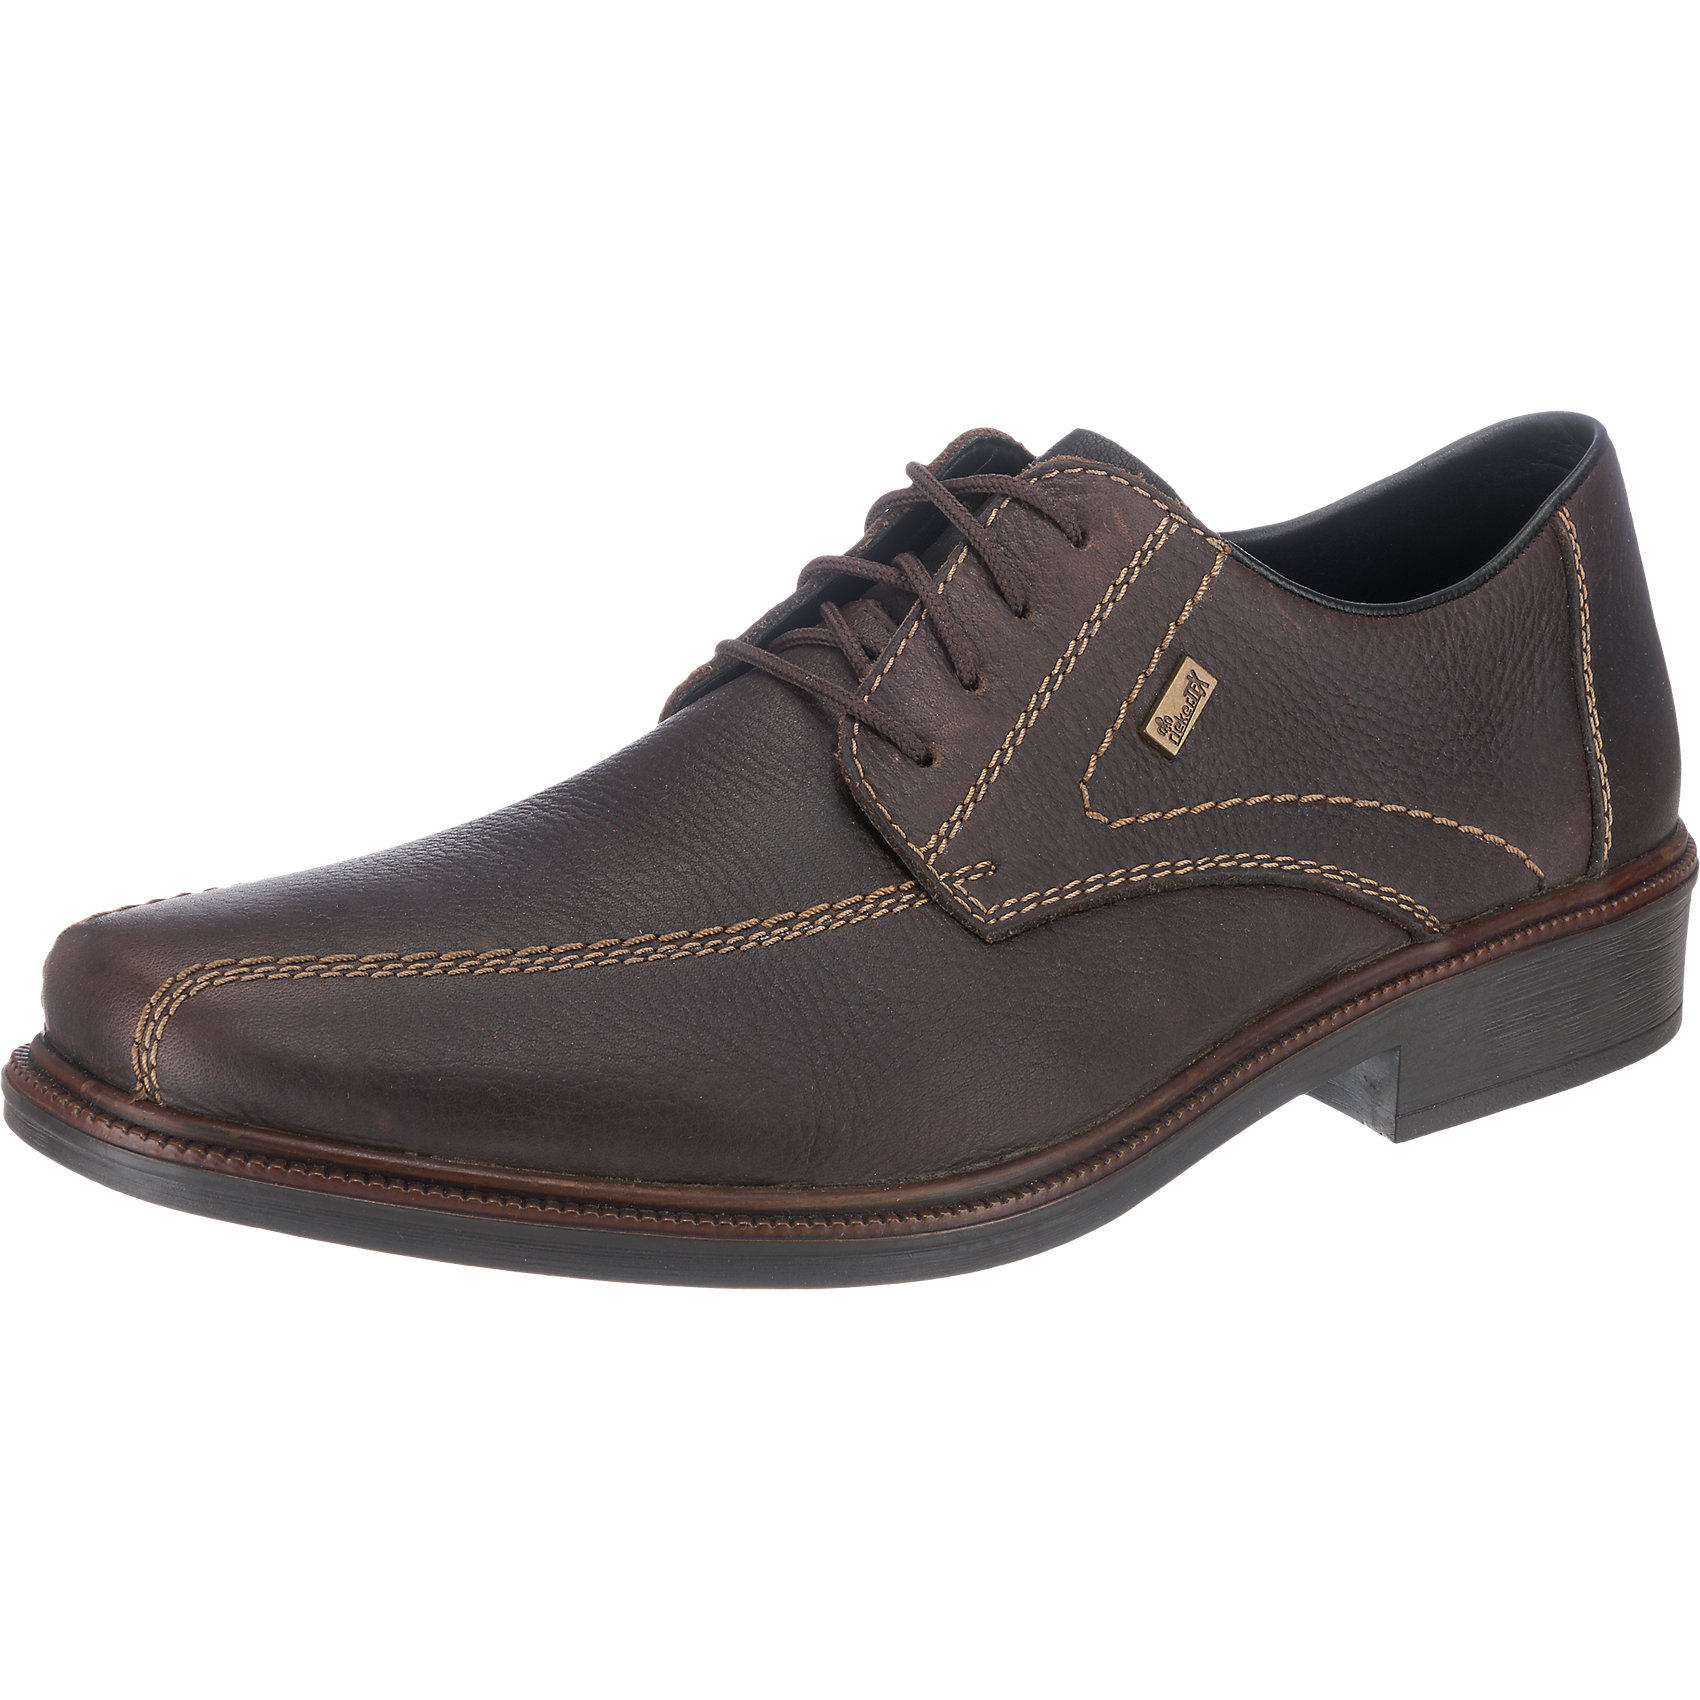 Neu rieker Freizeit Schuhe braun 5761836   eBay b1dcc890b0